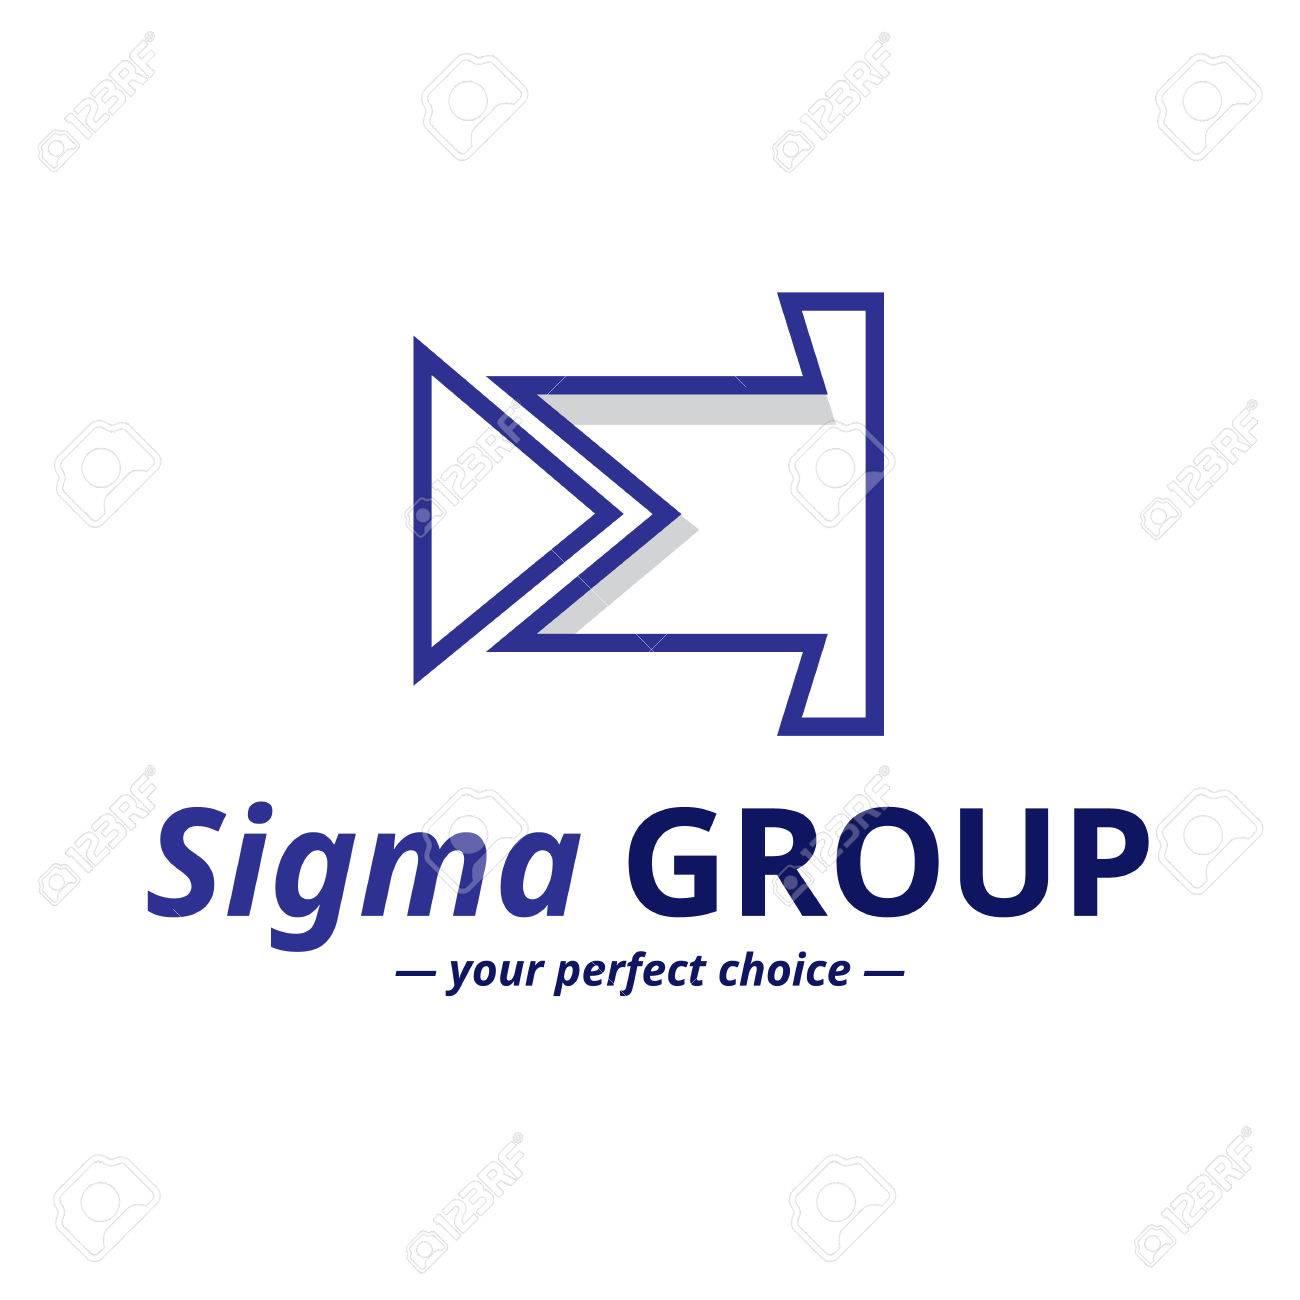 Vector minimalistic negative space greek letter logo sigma letter vector minimalistic negative space greek letter logo sigma letter symbol stock vector 55495541 biocorpaavc Choice Image